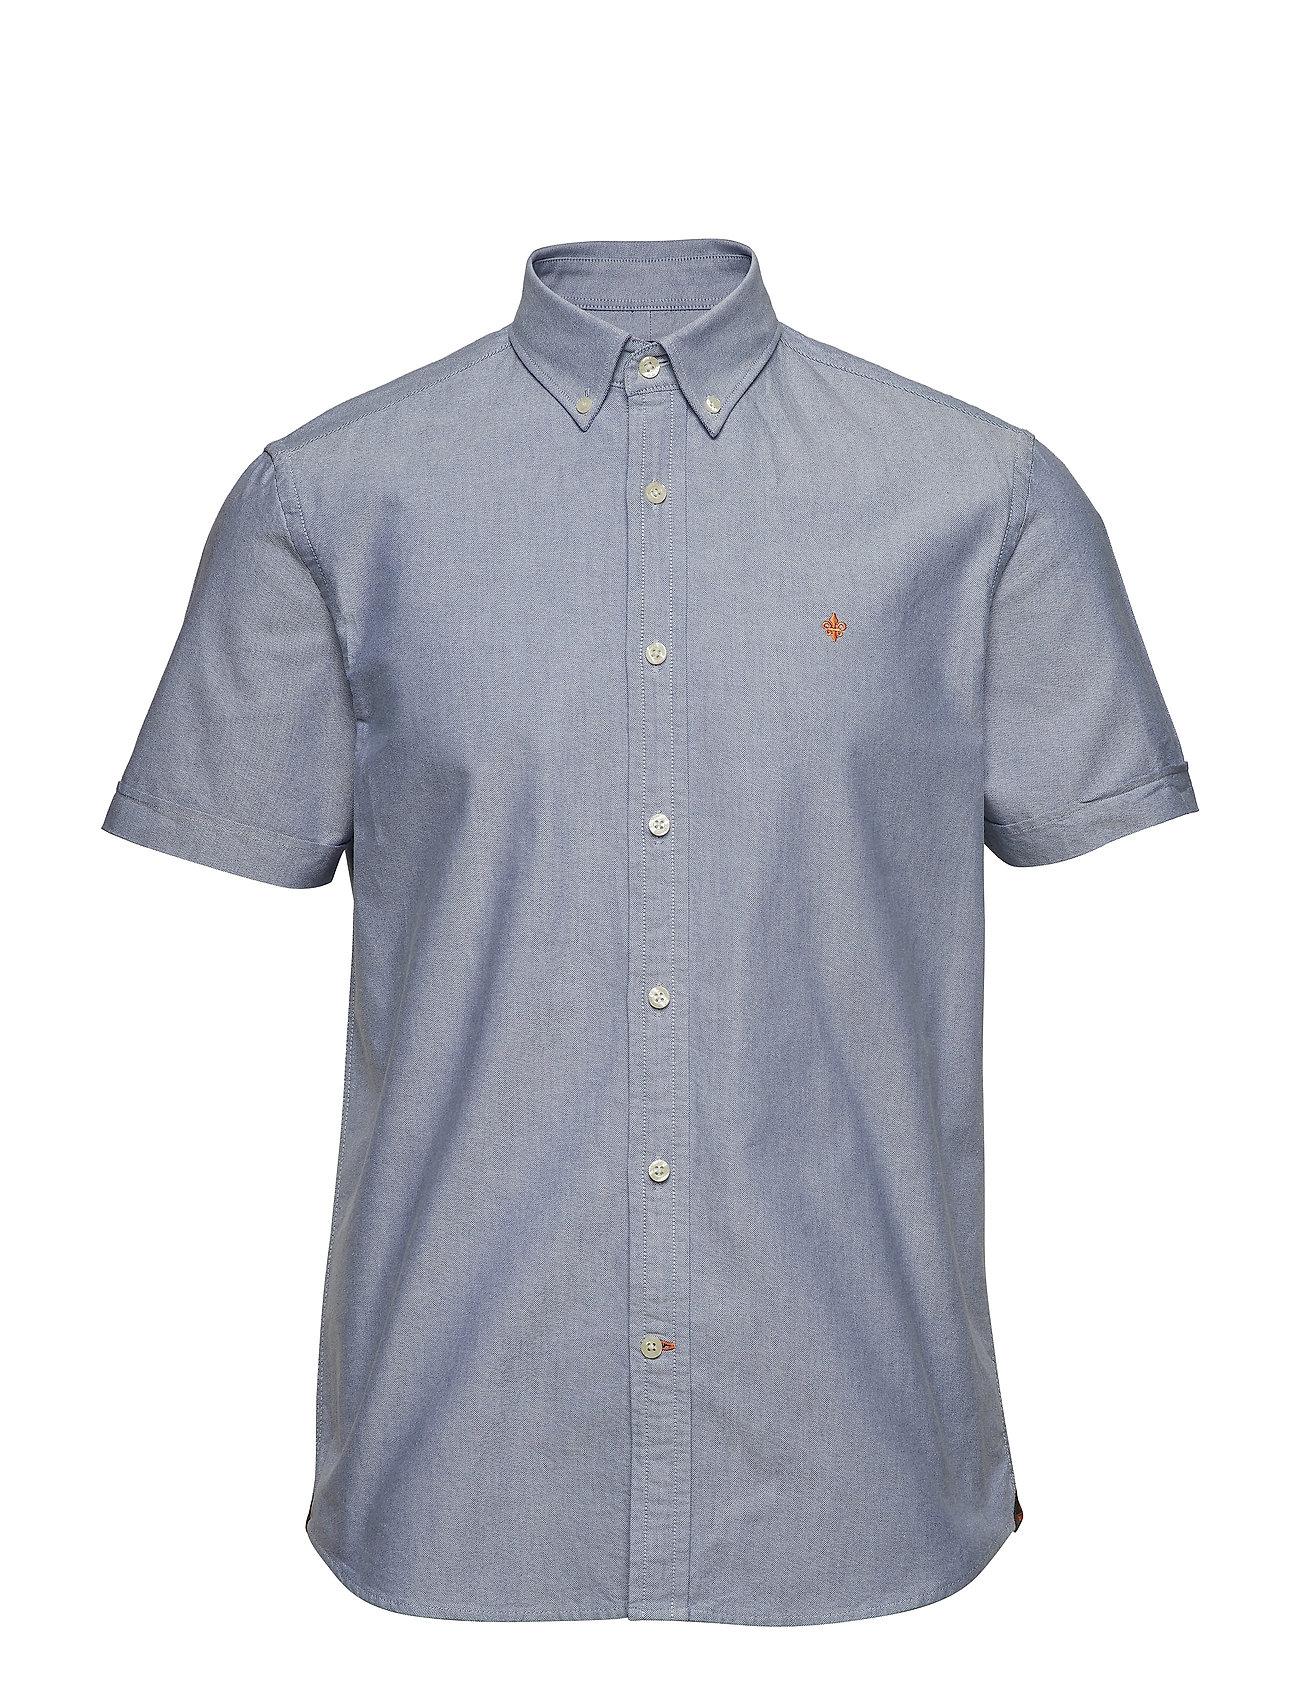 Morris Evan SS Button Down Shirt - BLUE